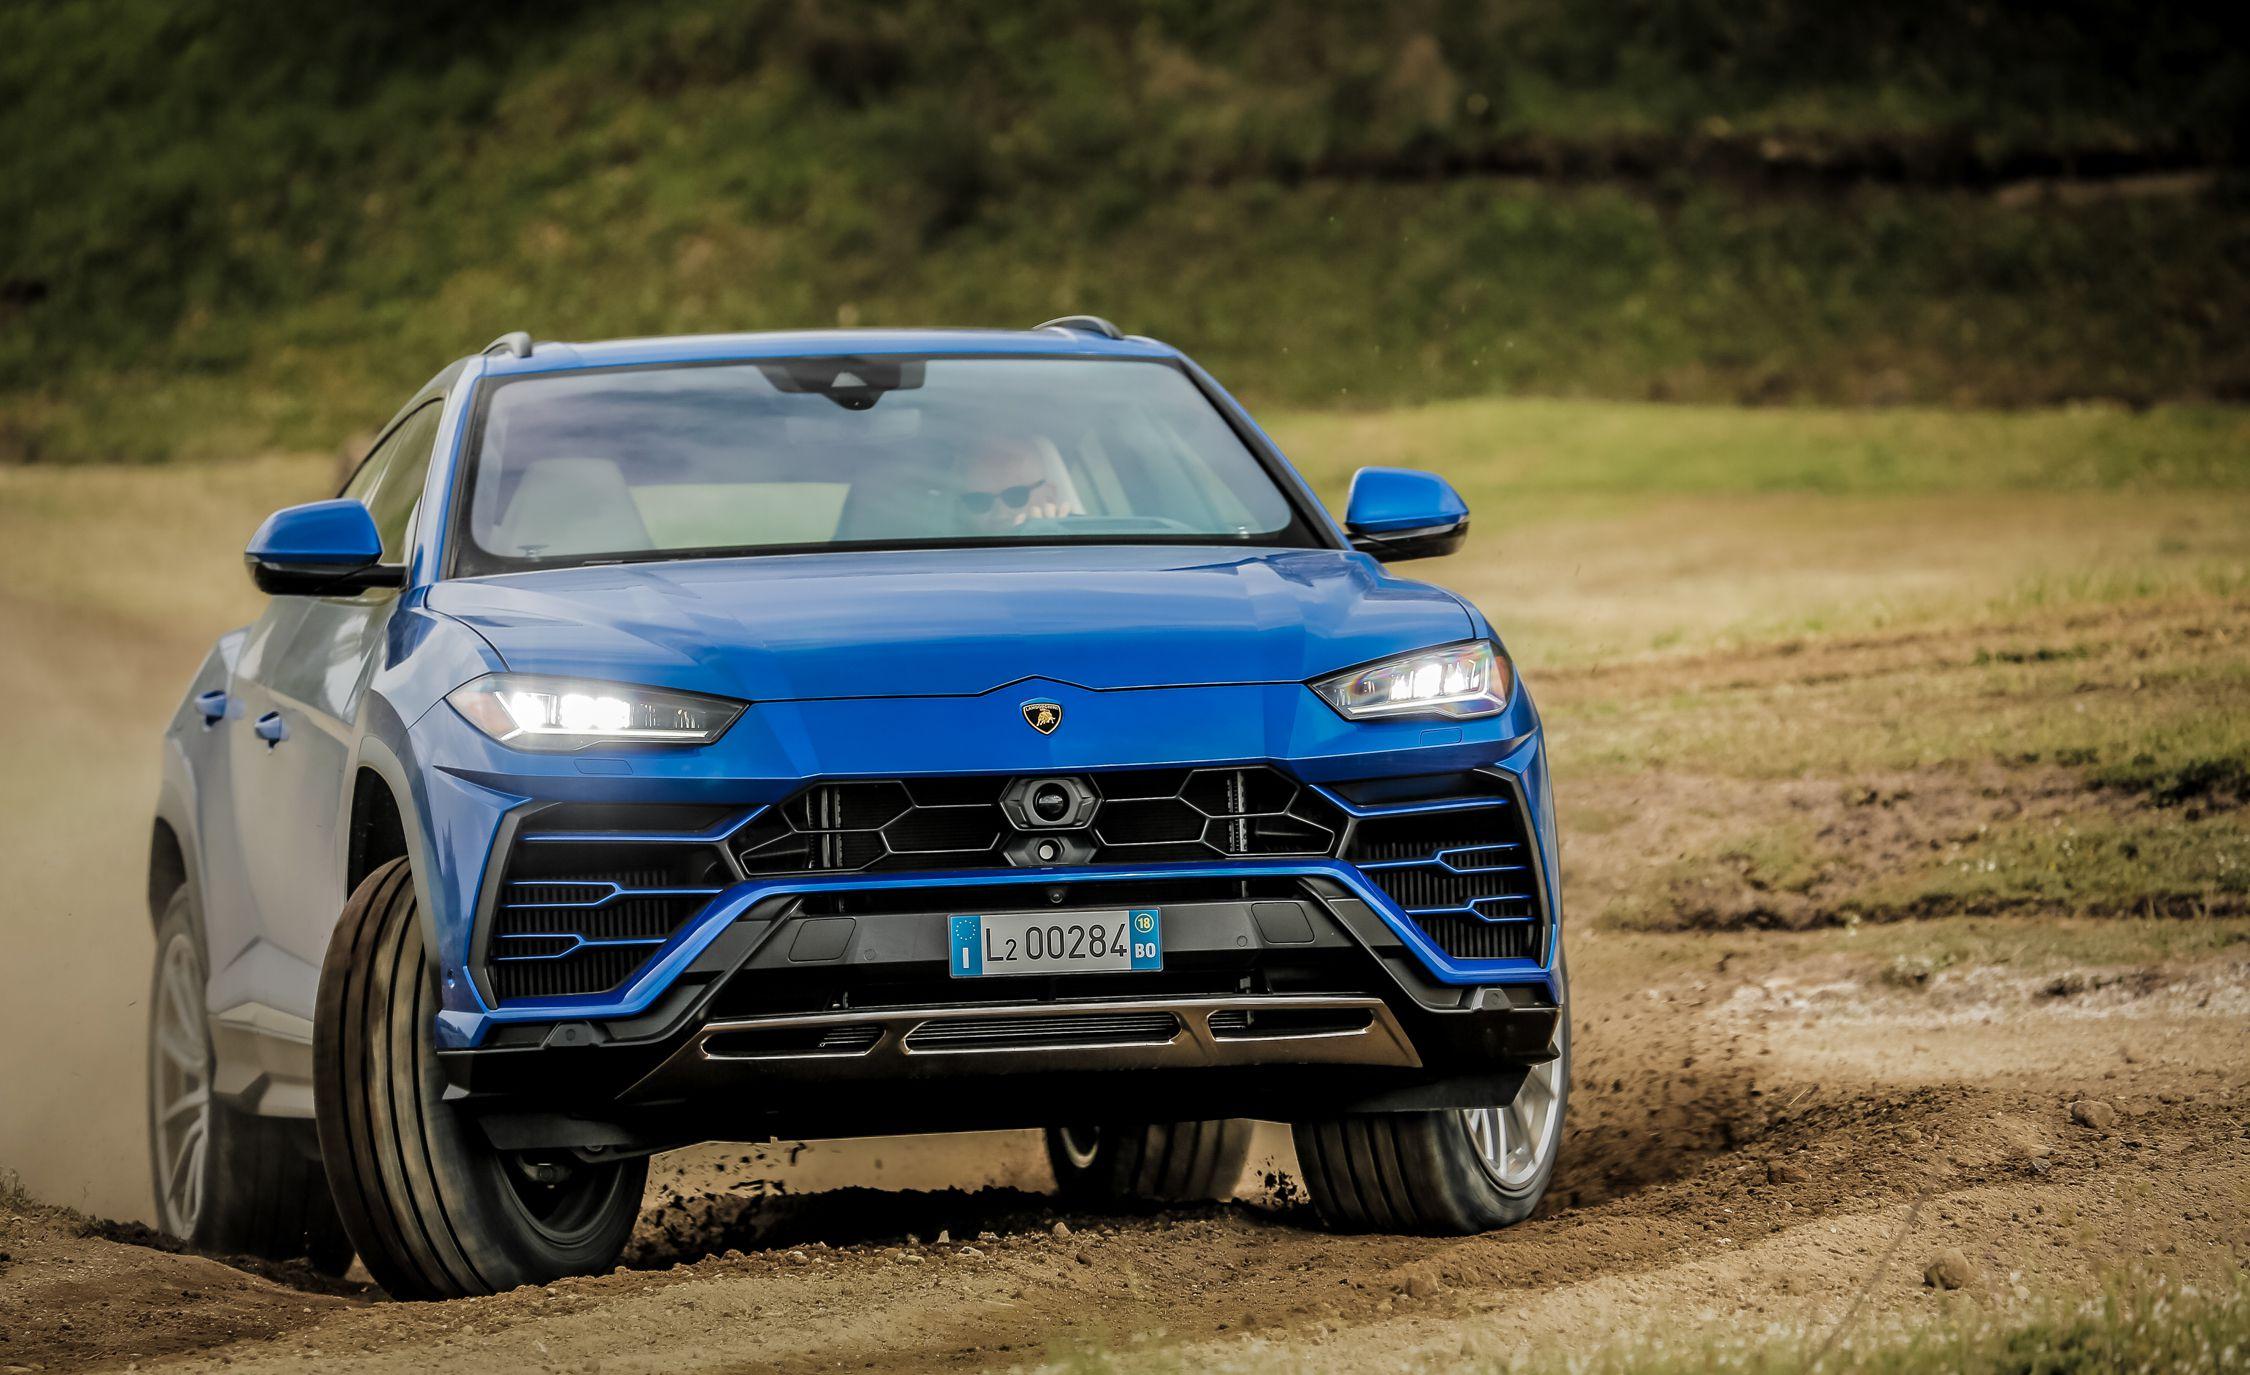 2019 Lamborghini Urus Off Road Wallpaper 49 Hd Wallpapers